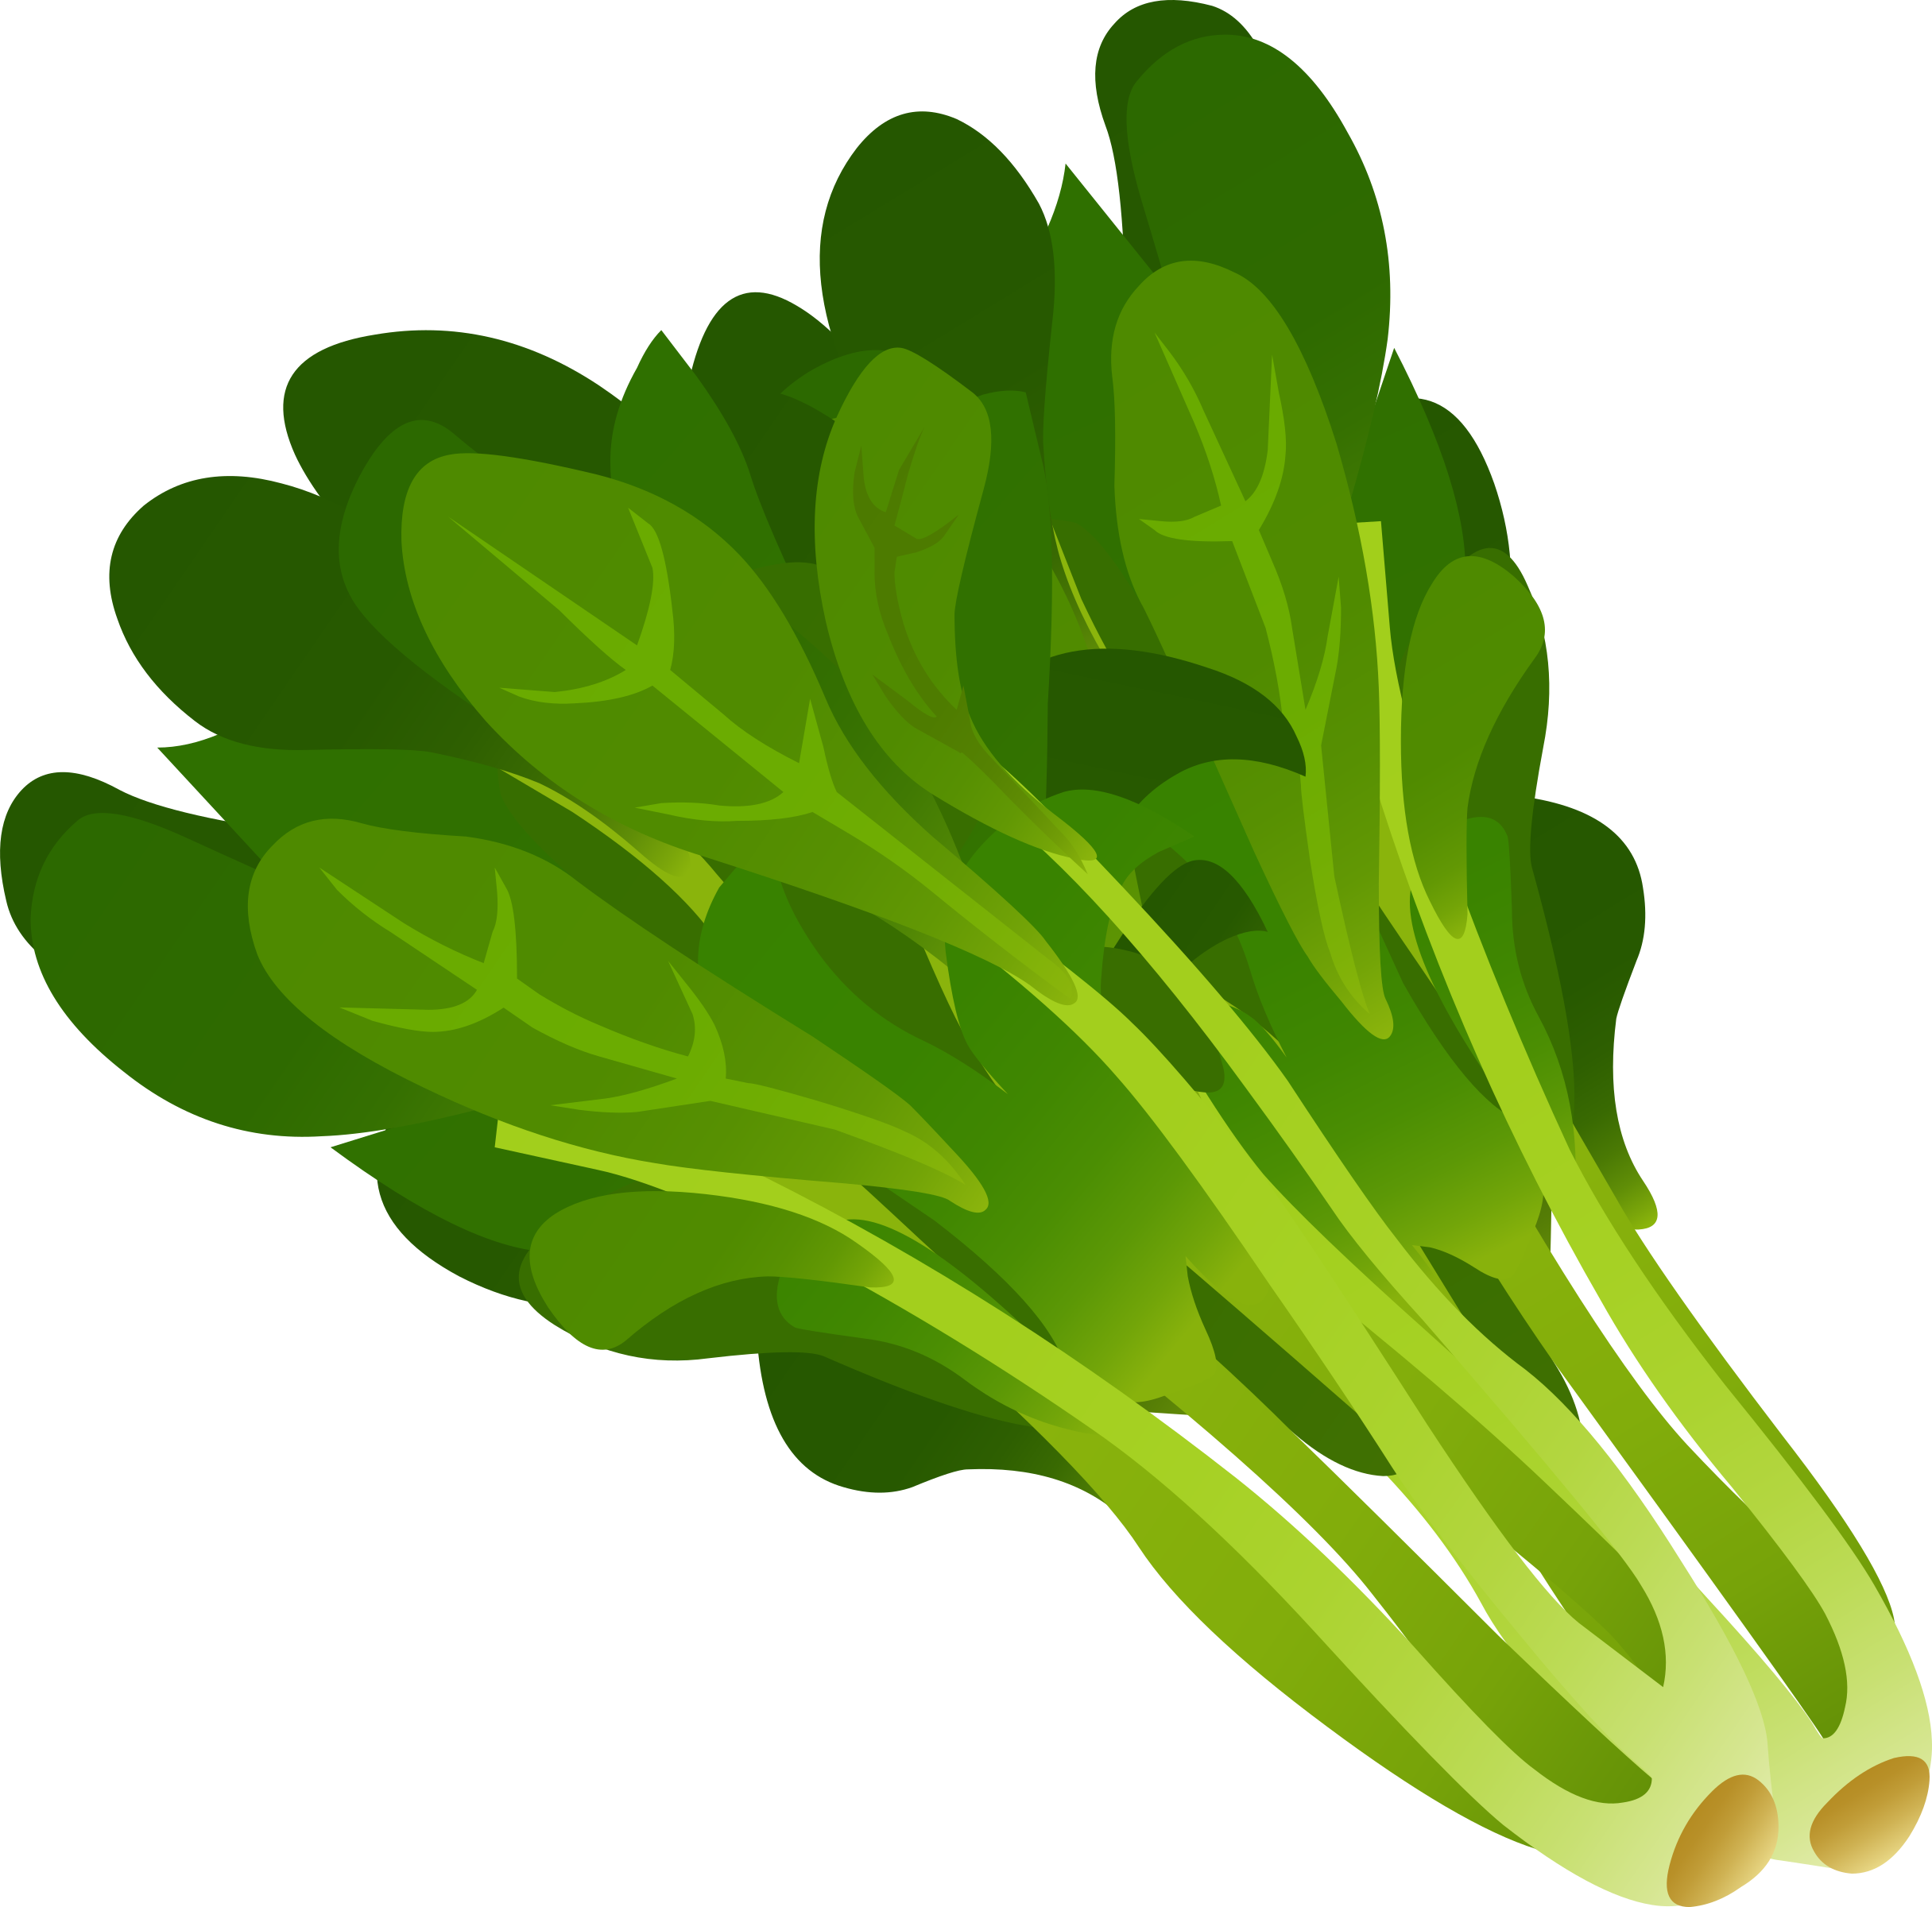 free Vegetables kangkong free on. Lettuce clipart vintage.